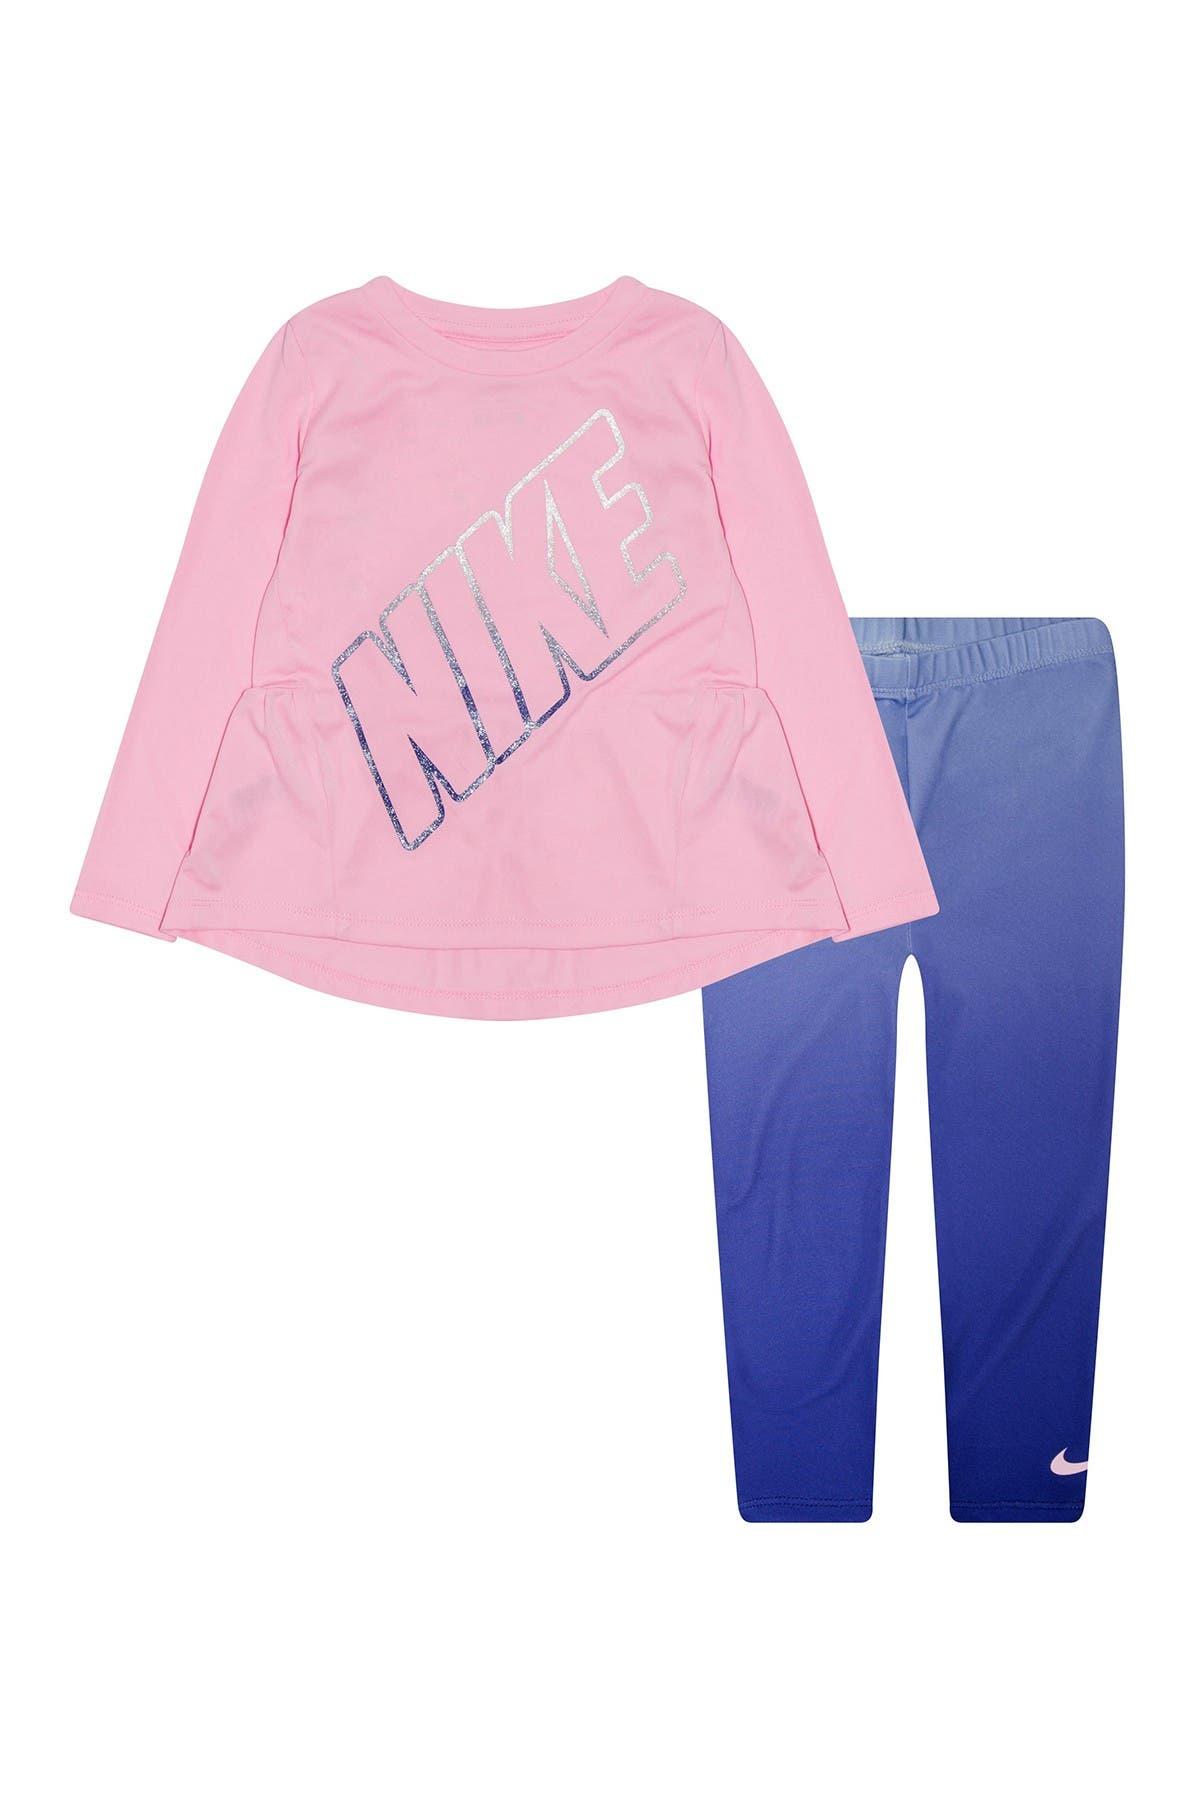 Image of Nike Ruffle Tunic & Leggings Set